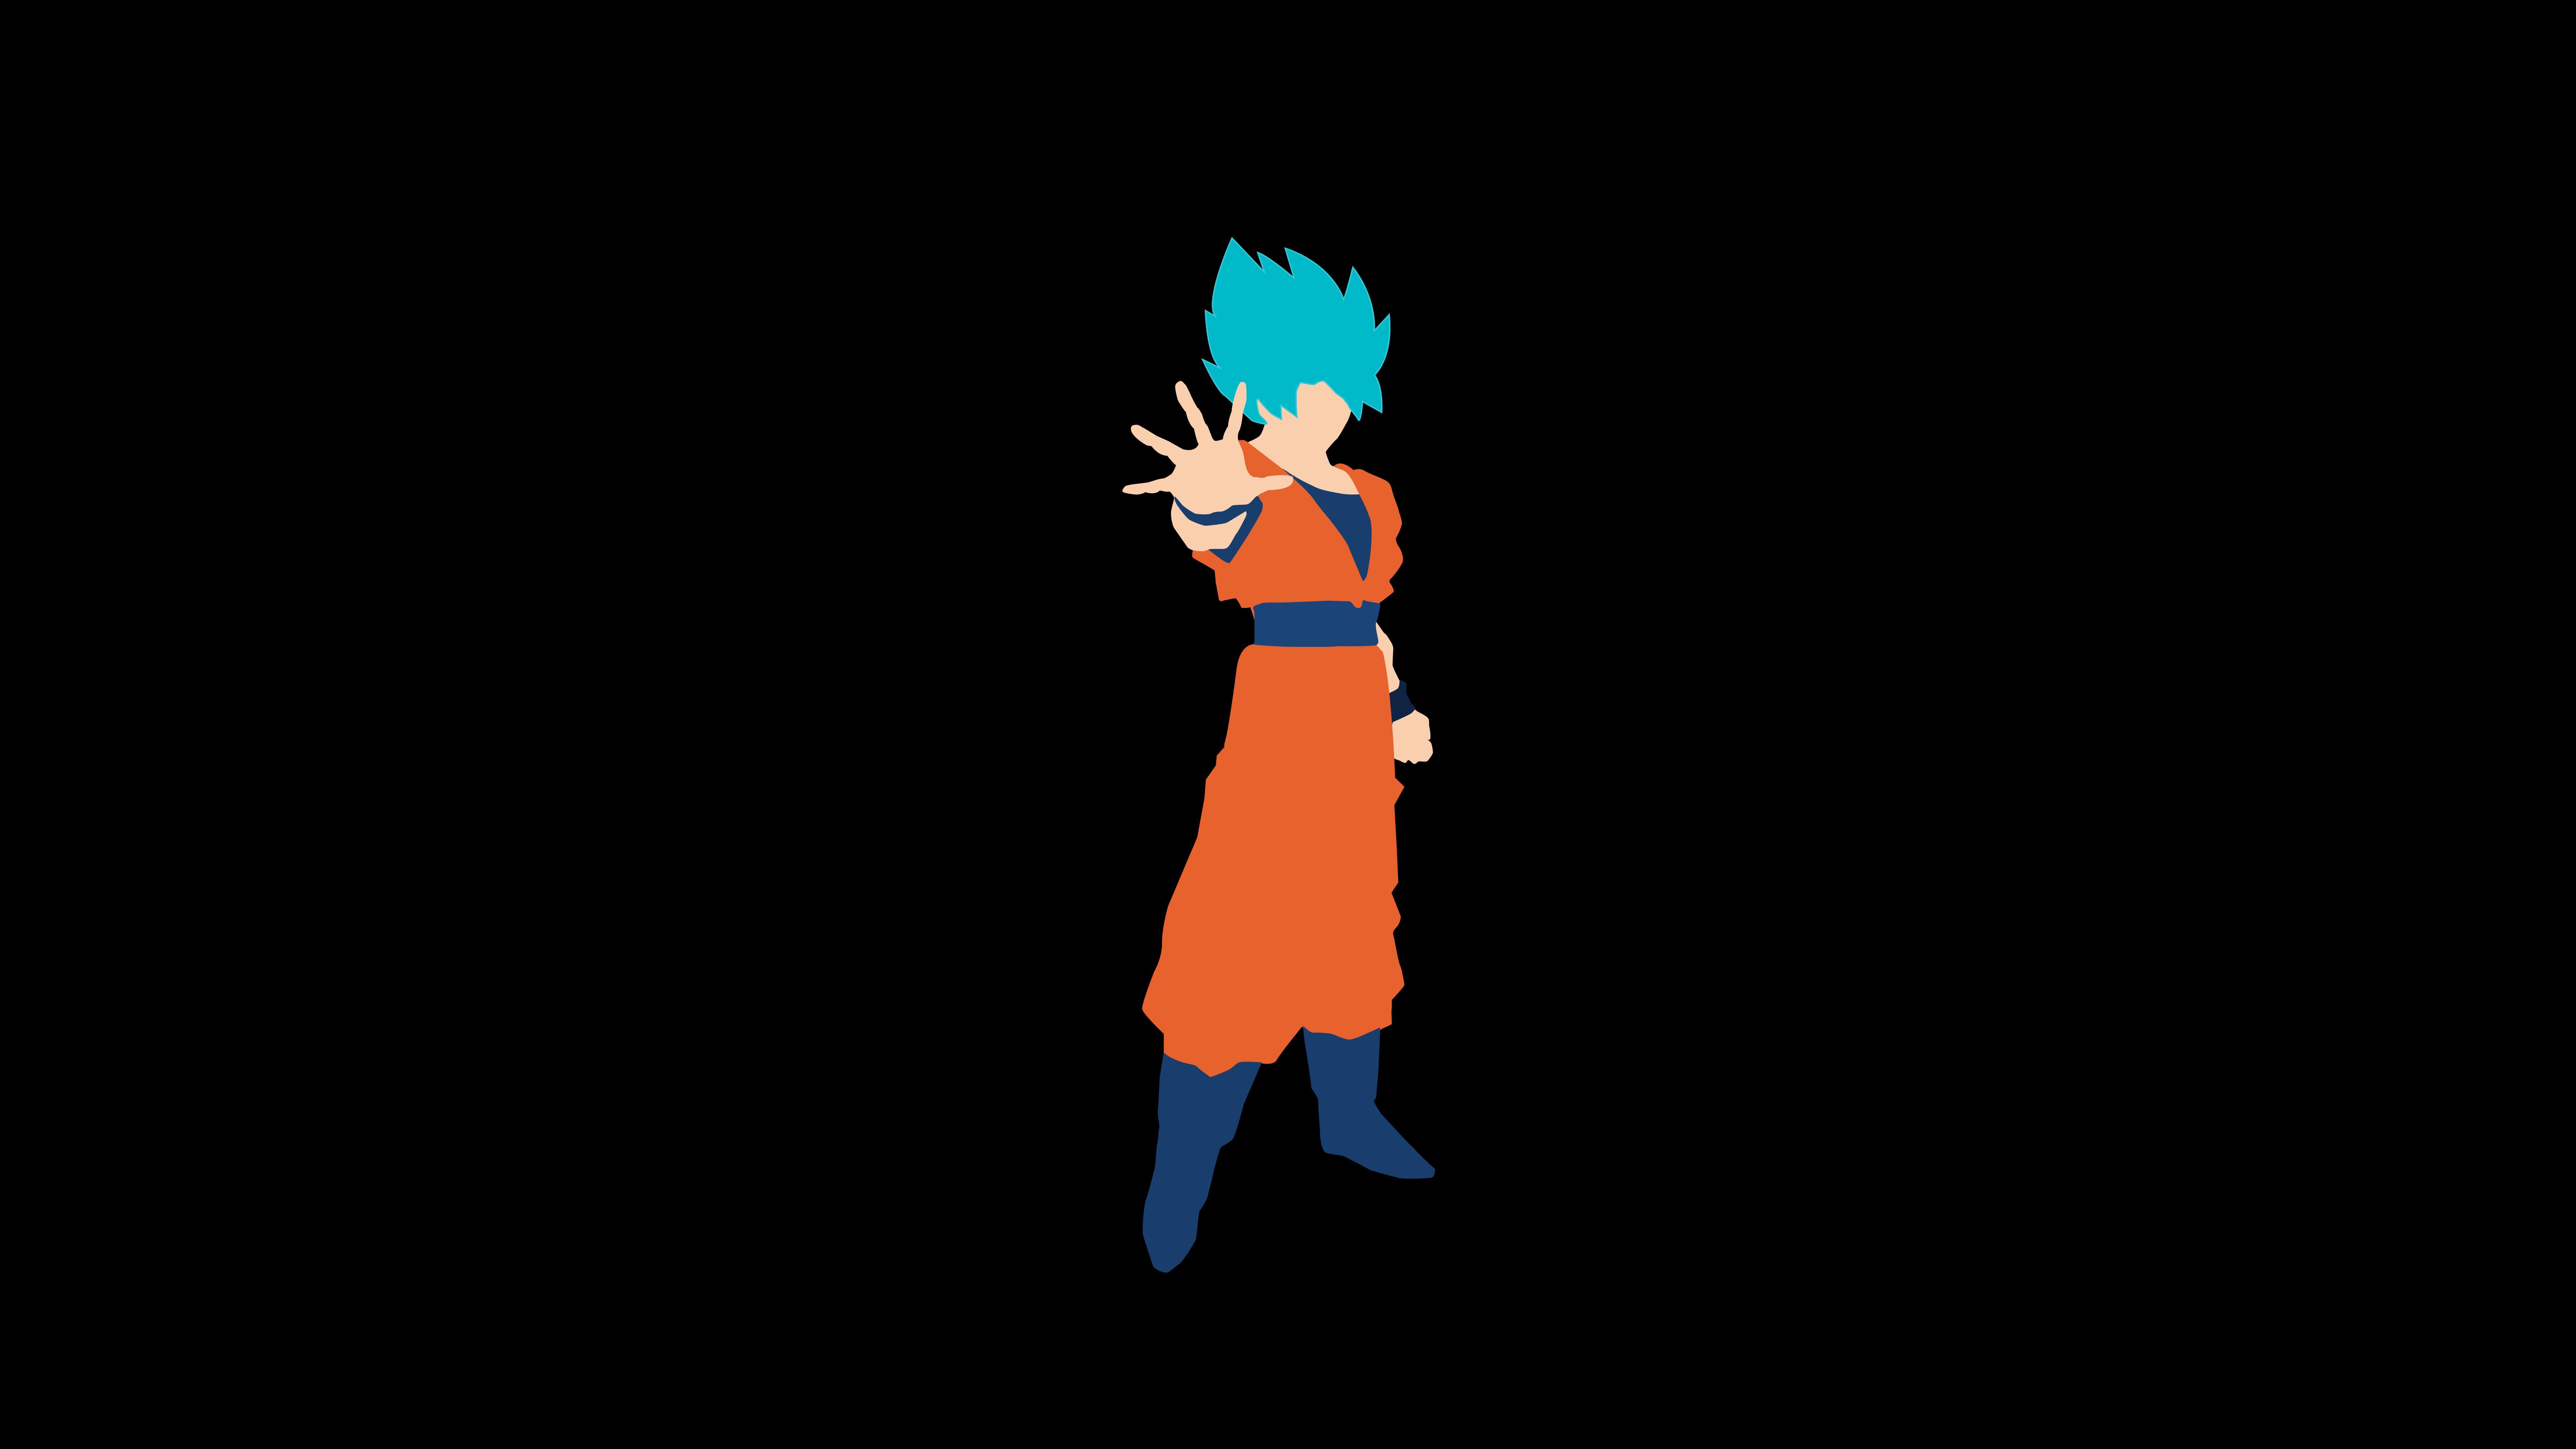 Goku Minimalism 8k Hd Superheroes 4k Wallpapers Images Anime Wallpaper Download Anime Wallpaper Spice And Wolf Holo